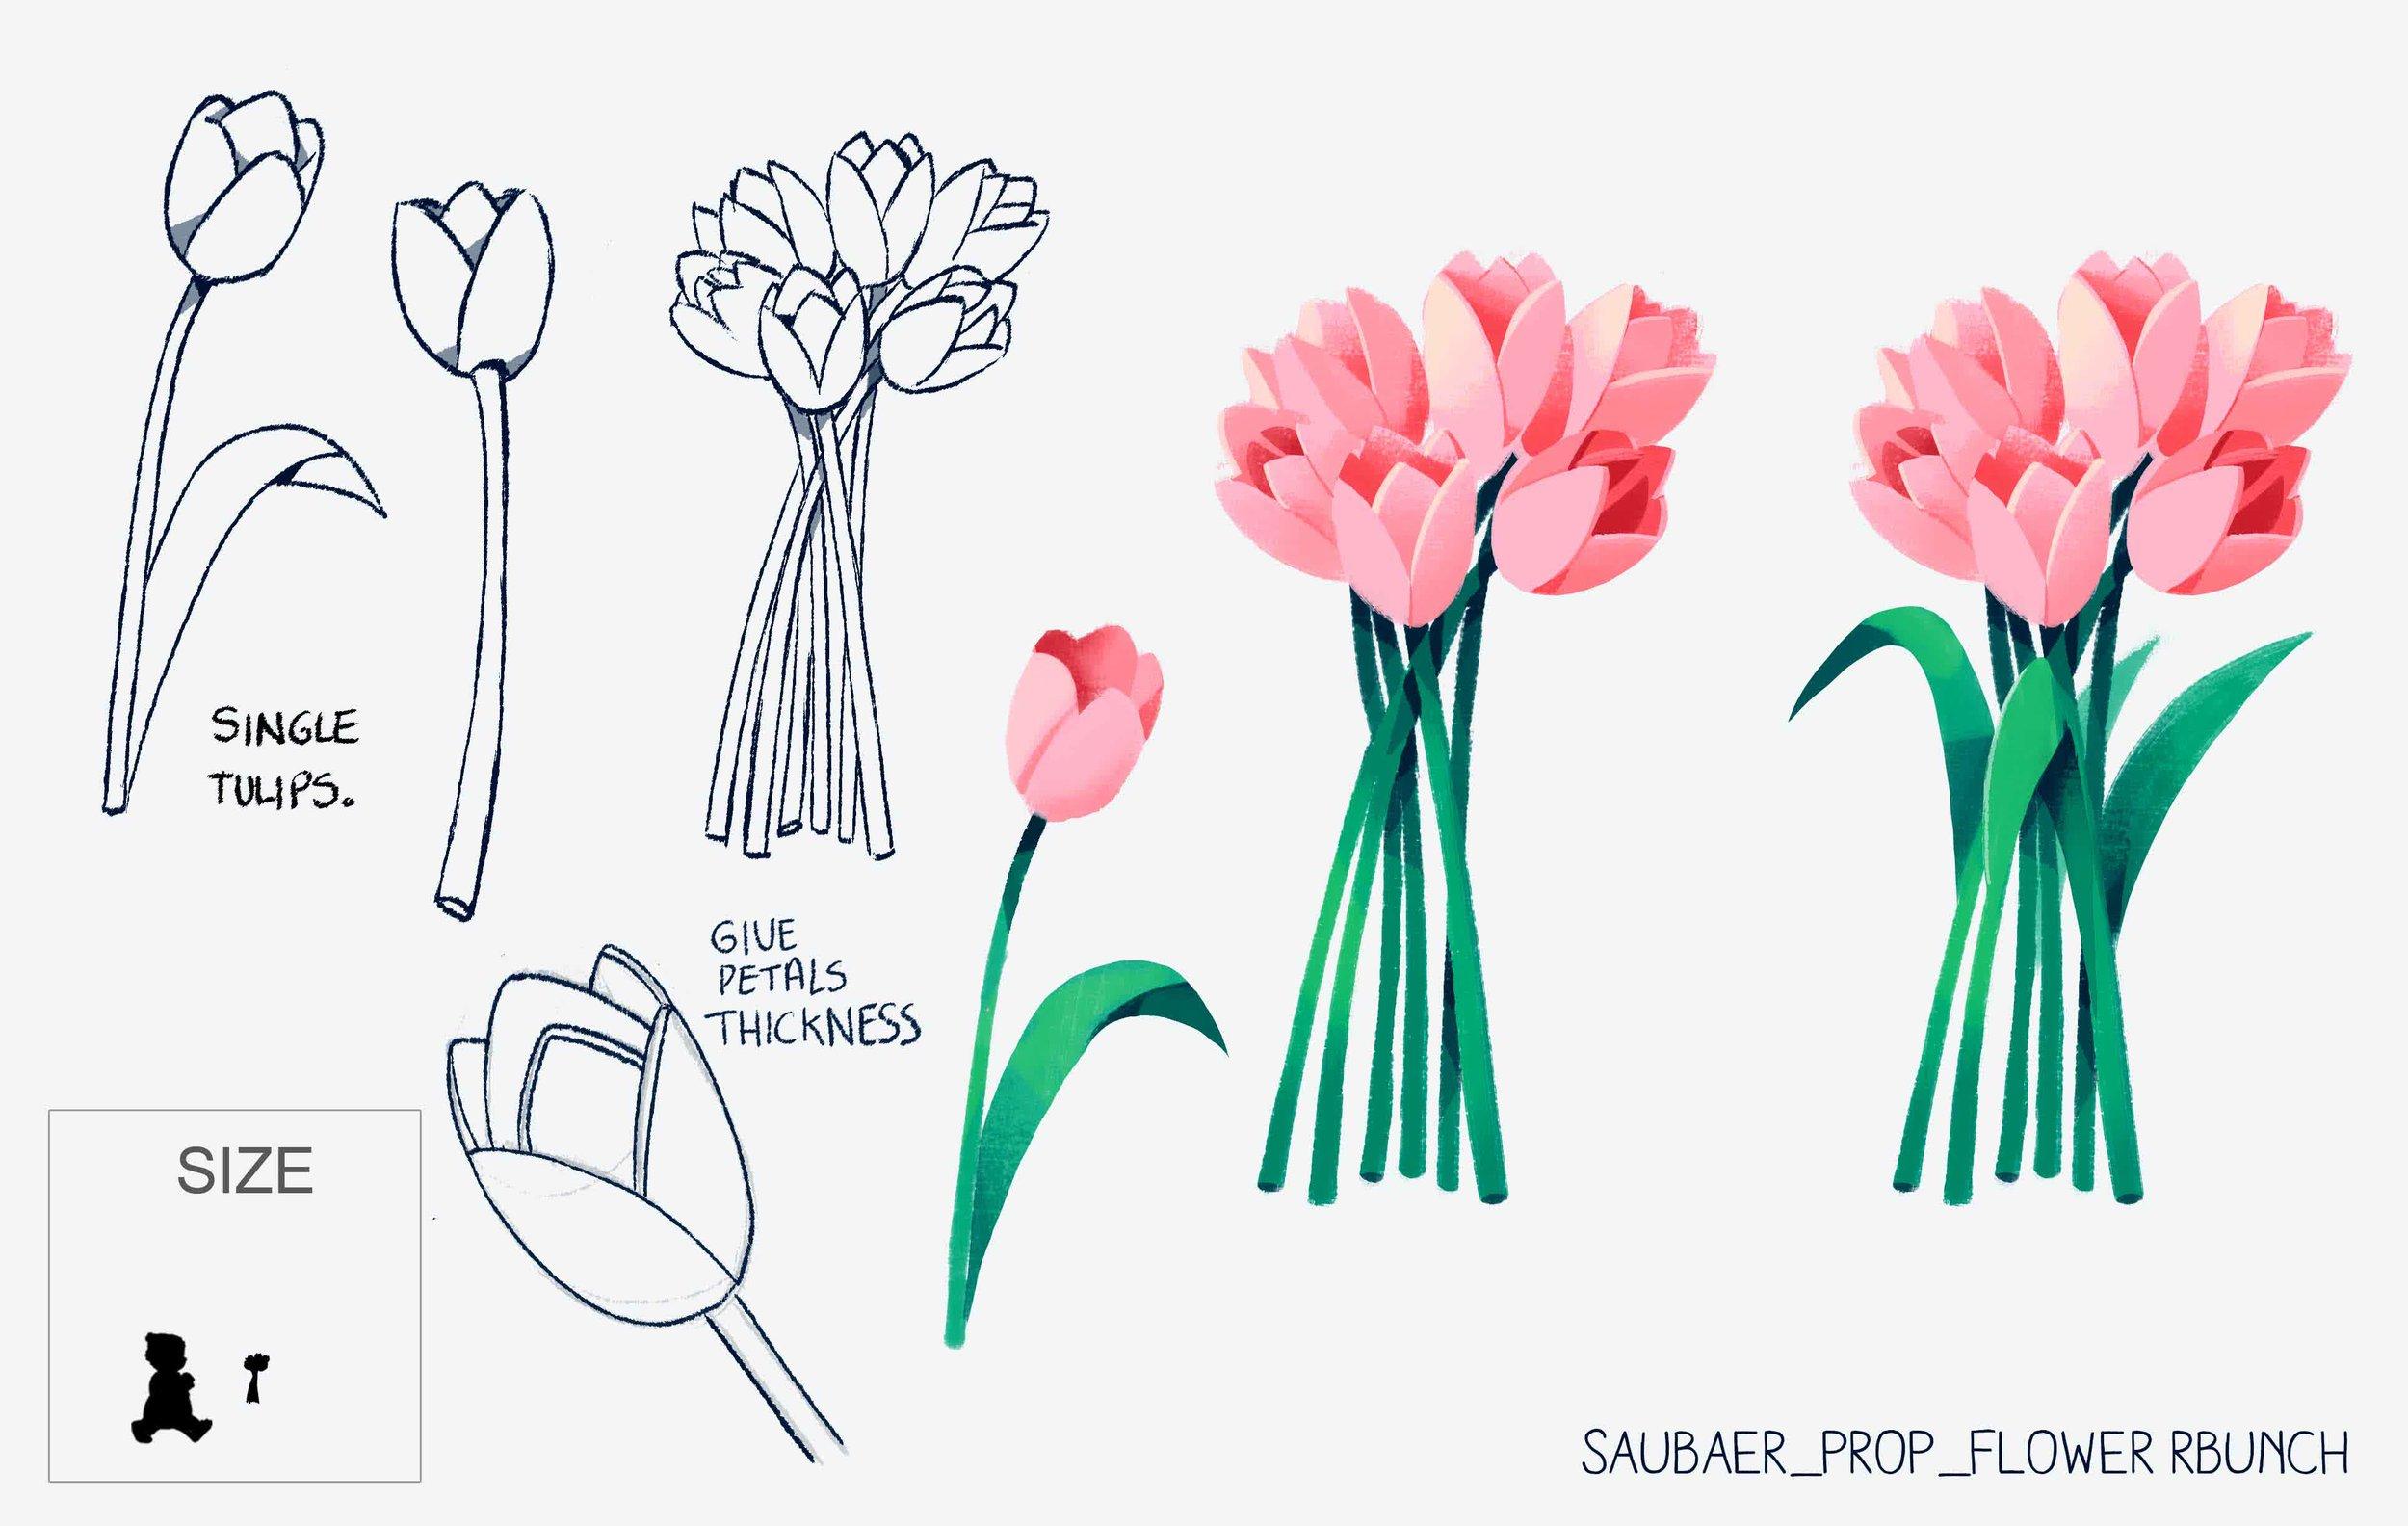 PROPS_FlowersBunch_DESIGN_SAUBAERPropFlowerBunch.v000_thumb.jpg